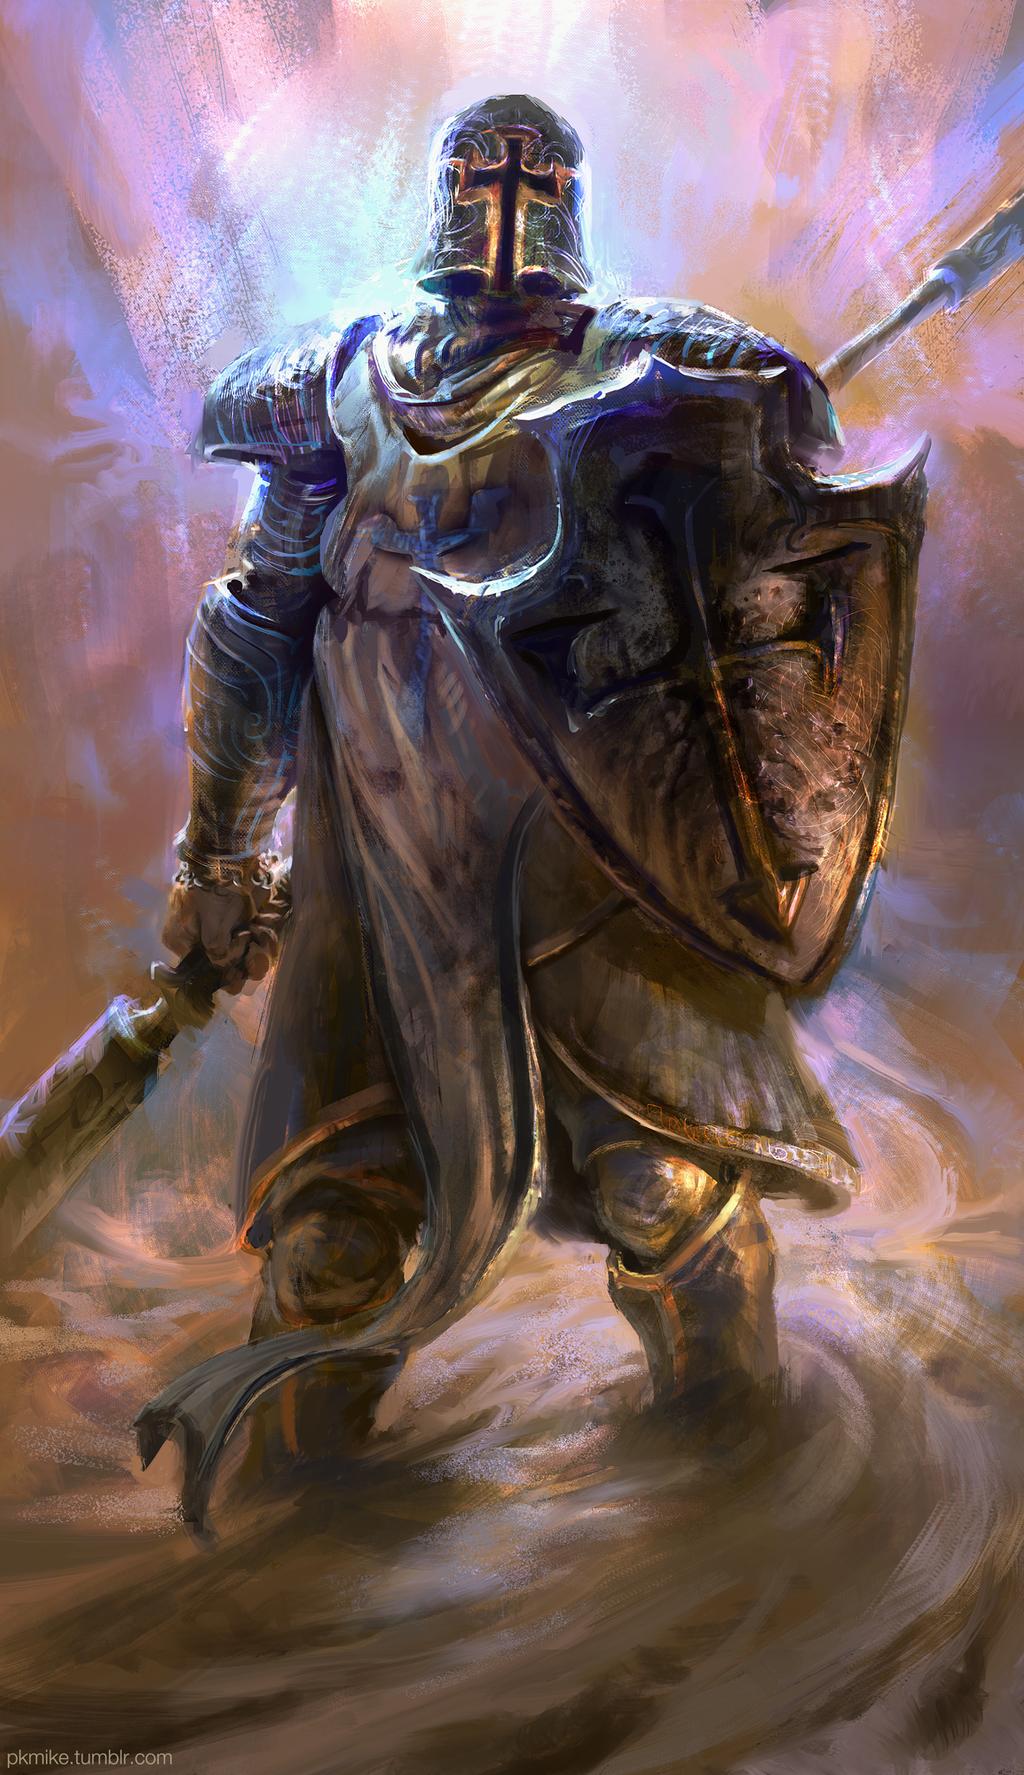 Crusader, Diablo 3 by MikeAzevedo